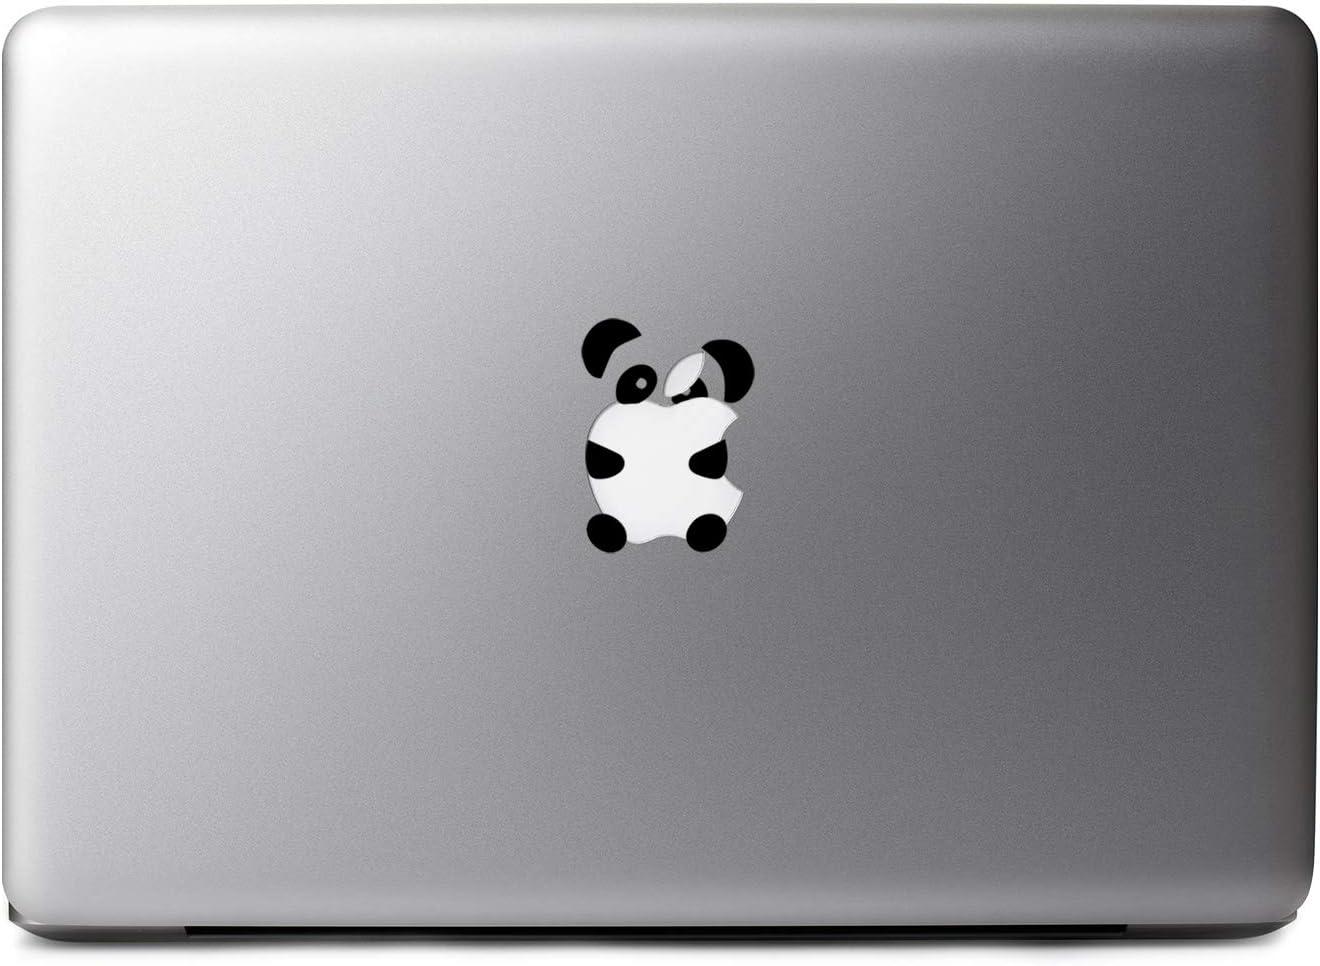 "Furivy - Panda - Apple MacBook Air/Pro/Retina 13"" (Black)"